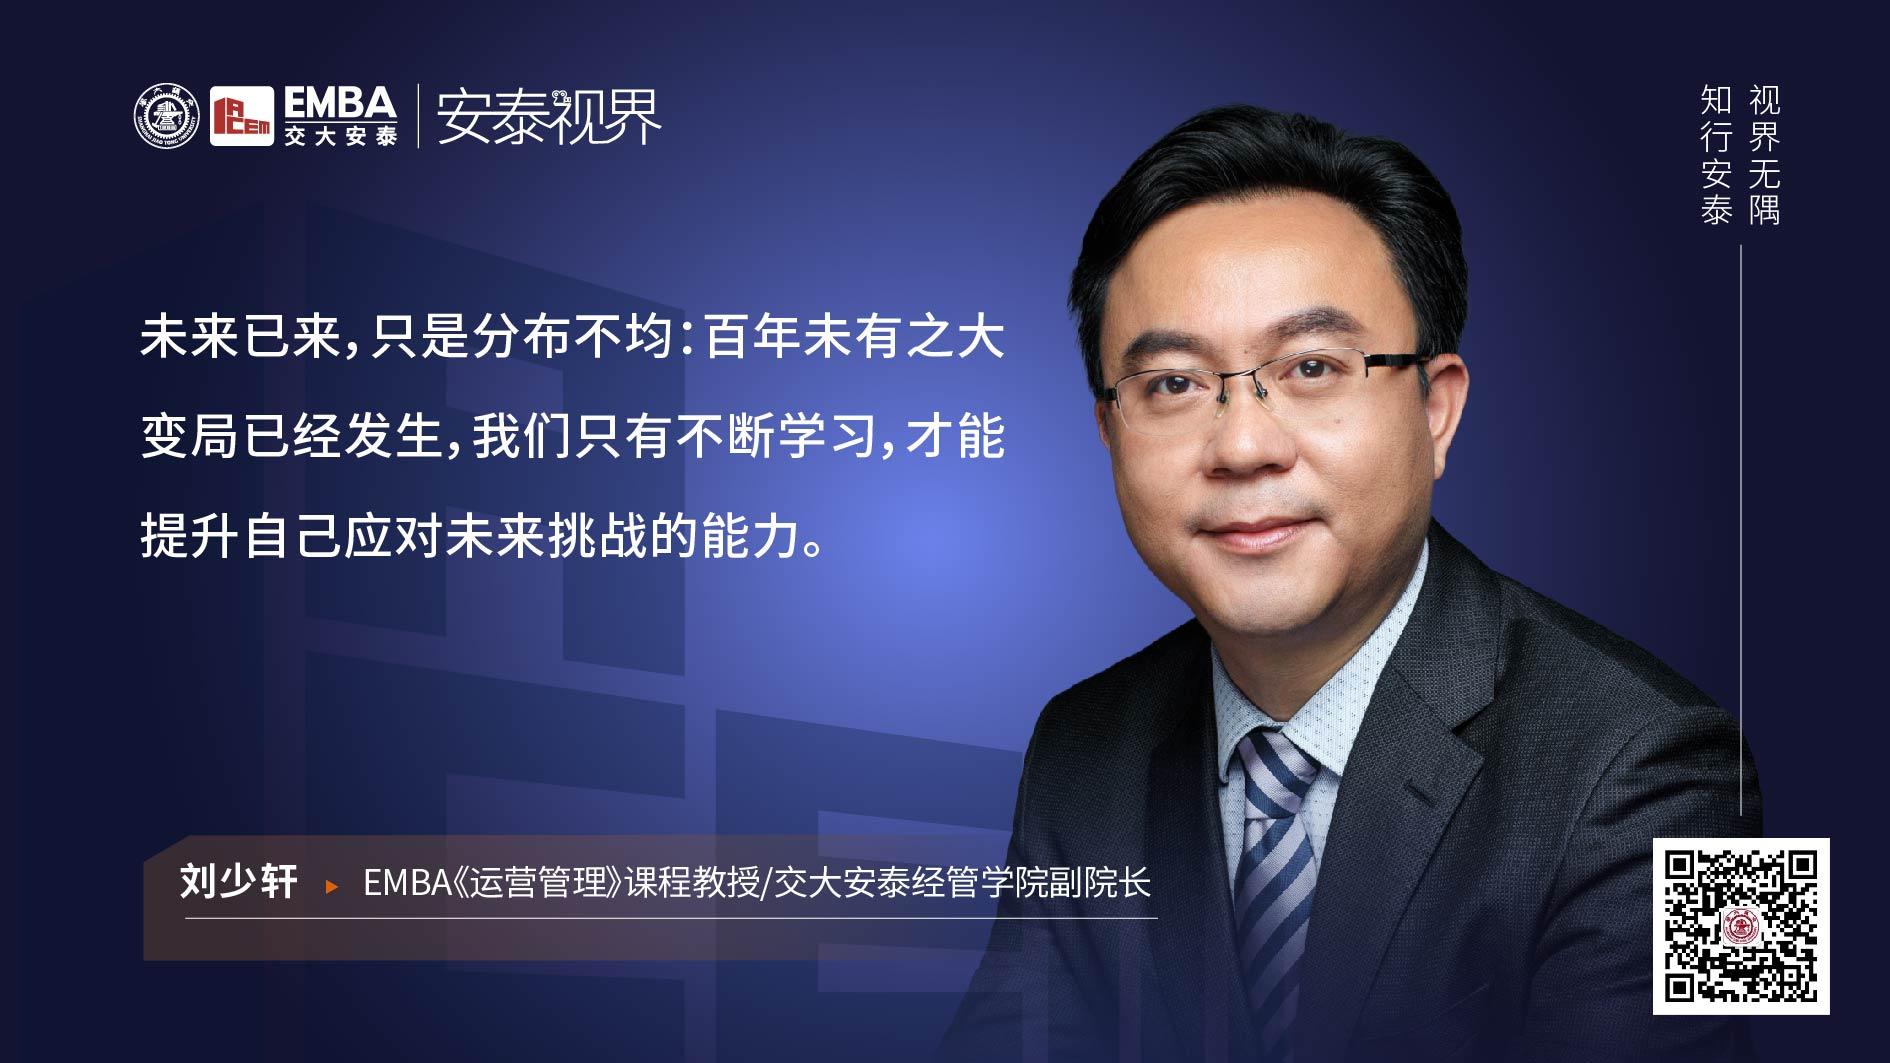 jiaoda安泰副院长刘少xuan: 三da政策建言疫情下供应链风险guanli | 安泰shi界